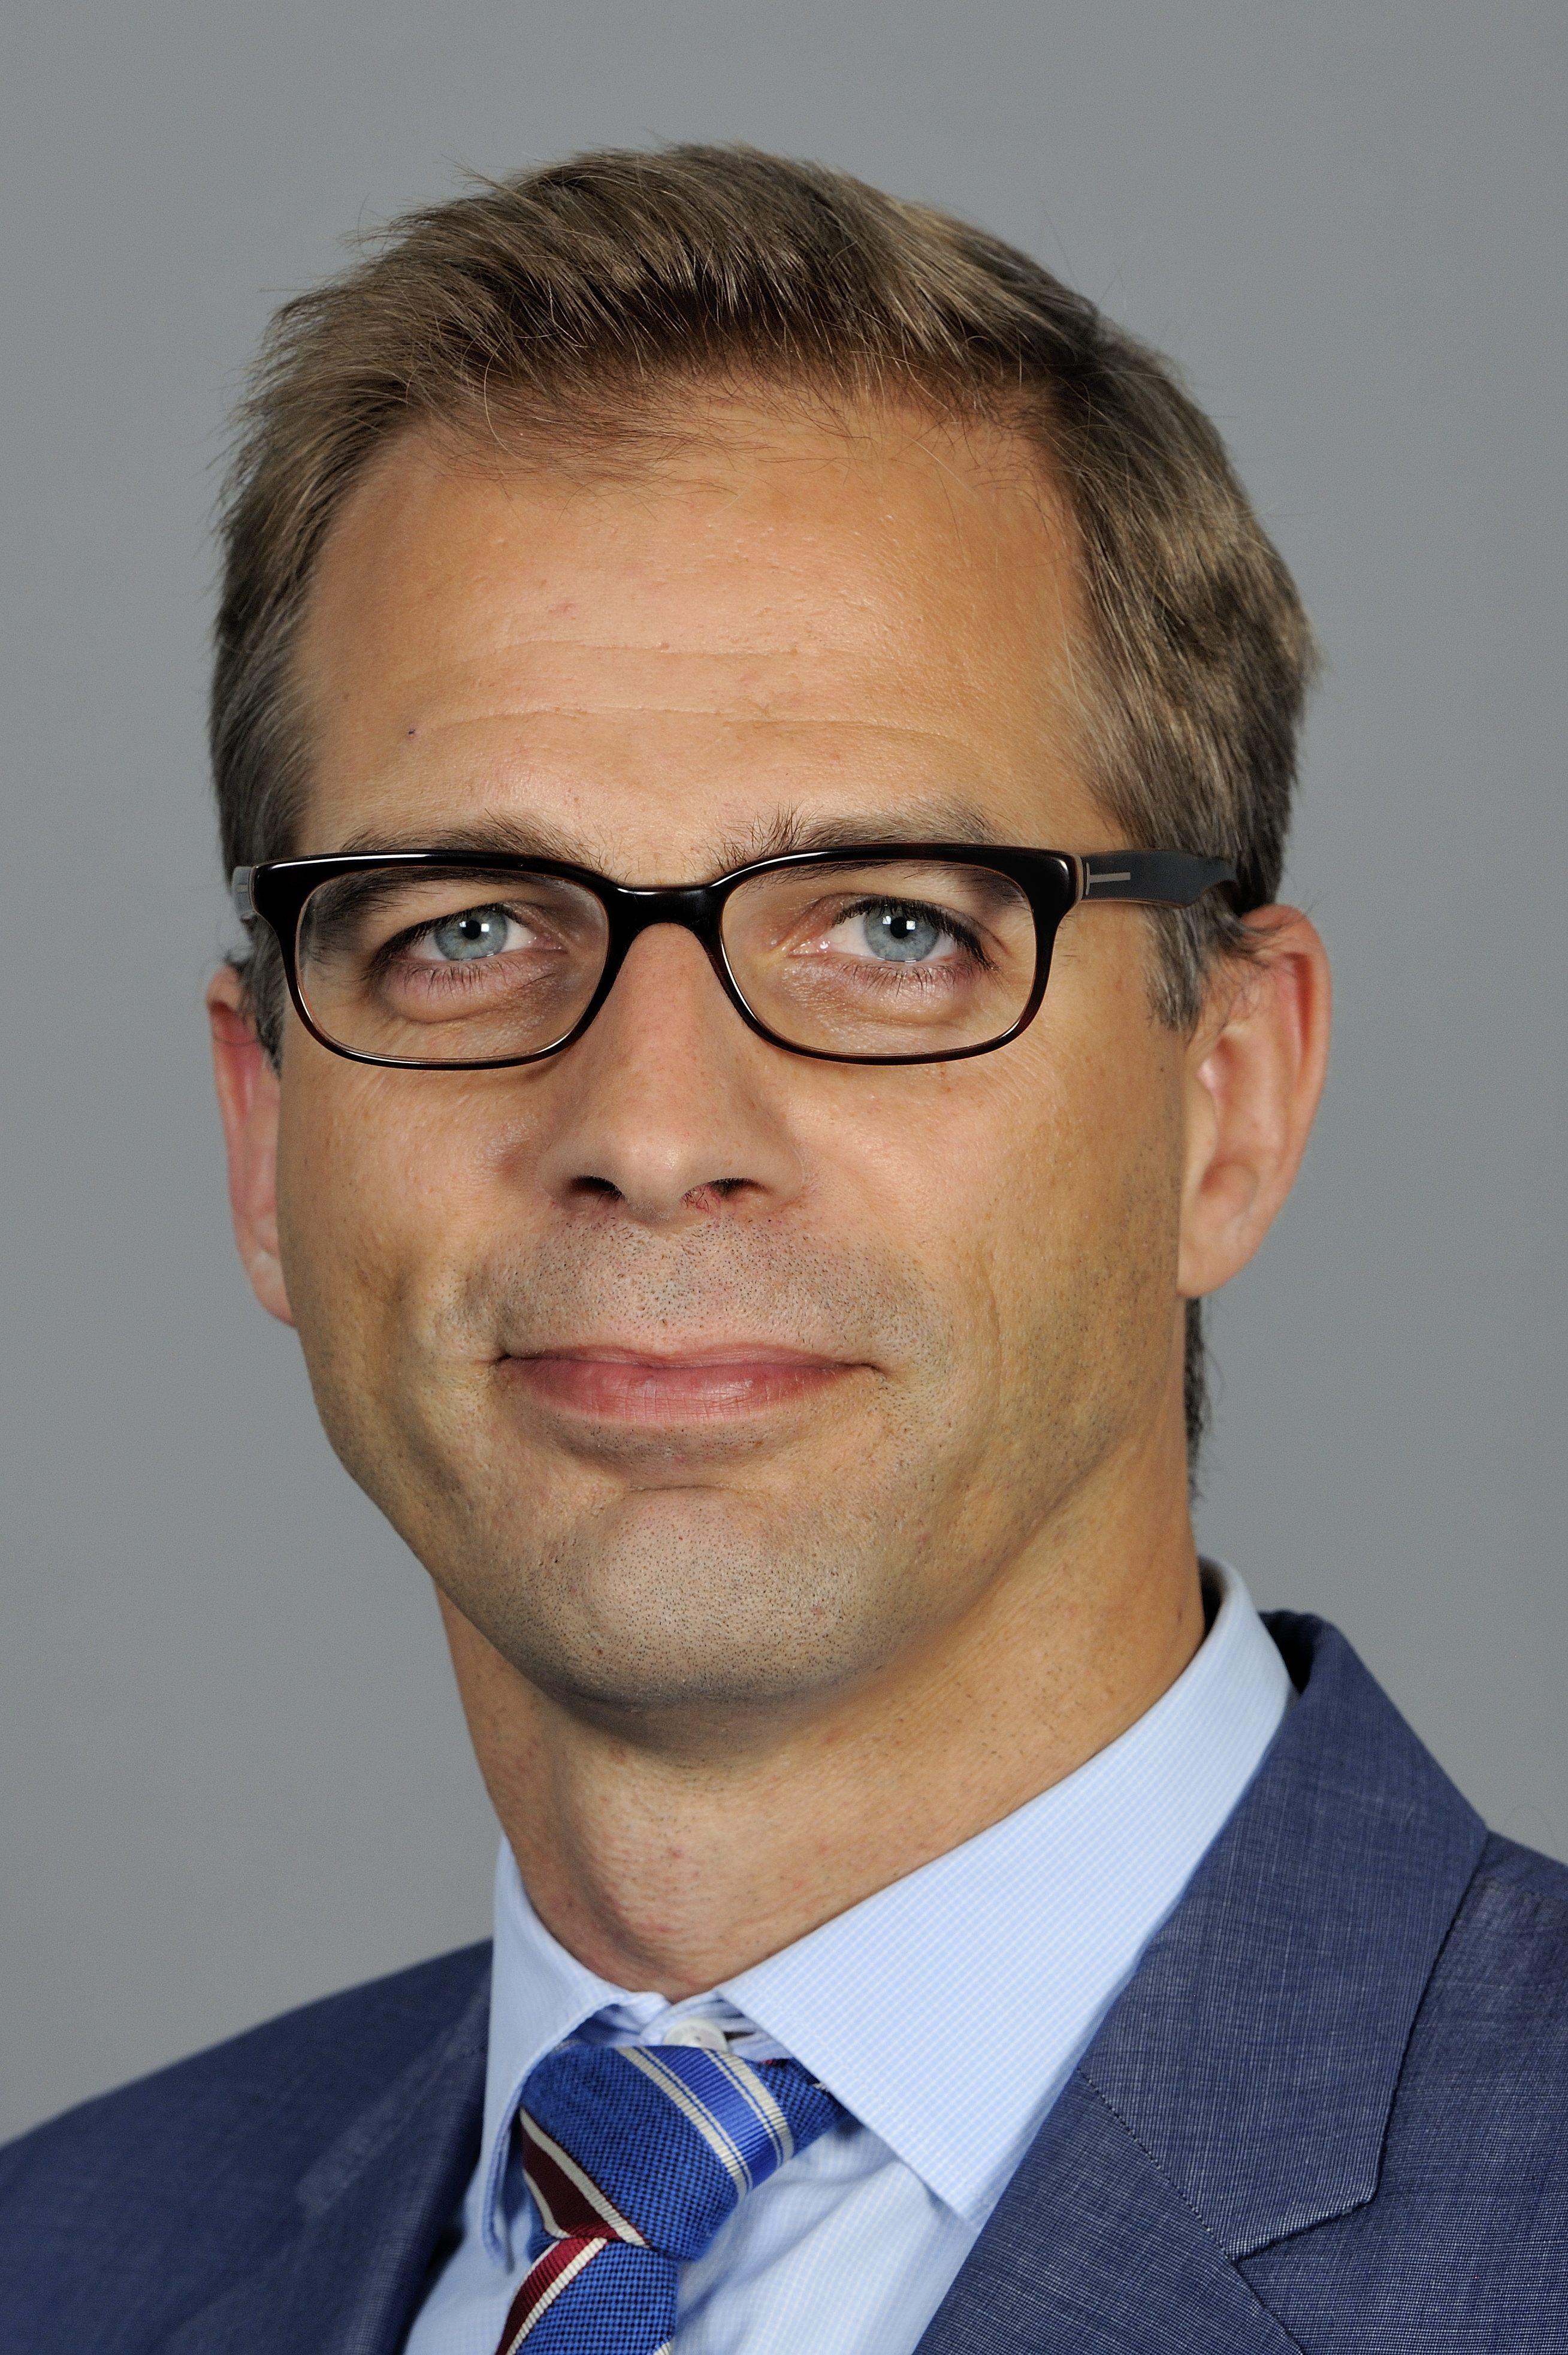 https://upload.wikimedia.org/wikipedia/commons/1/10/Stefan_Liebich_%28Martin_Rulsch%29_2014-09-10_1.jpg